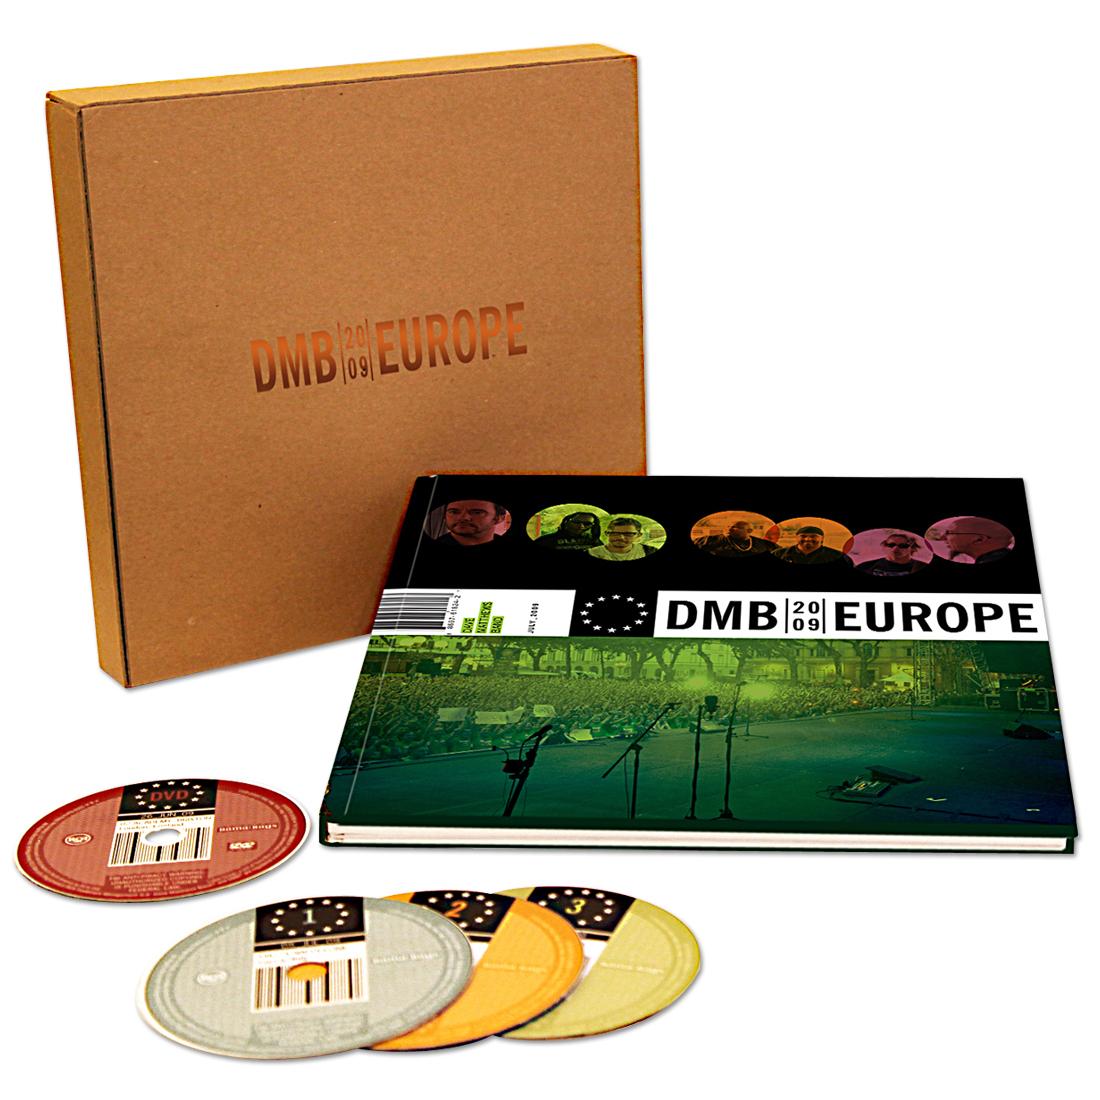 DMB Europe 2009 Box Set